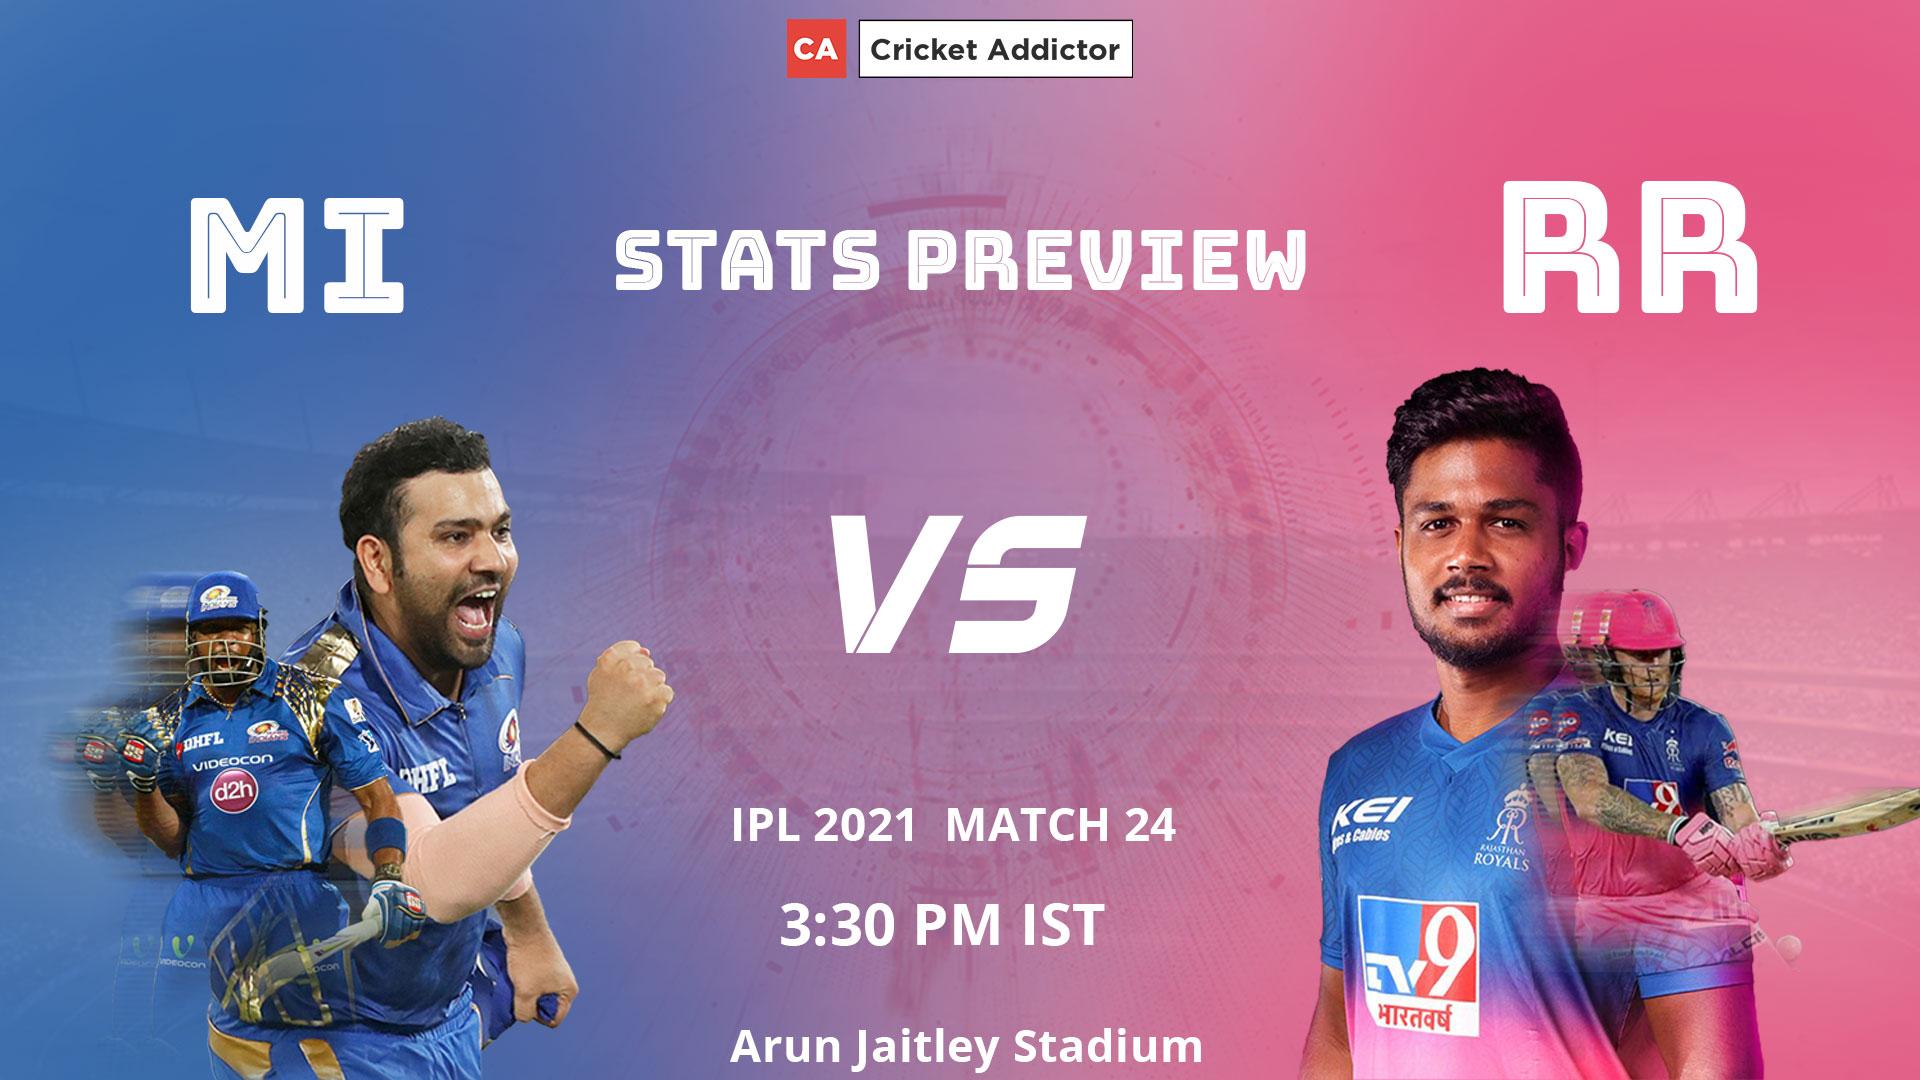 IPL 2021, Mumbai Indians, Rajasthan Royals, MI, RR, MI vs RR, Stats